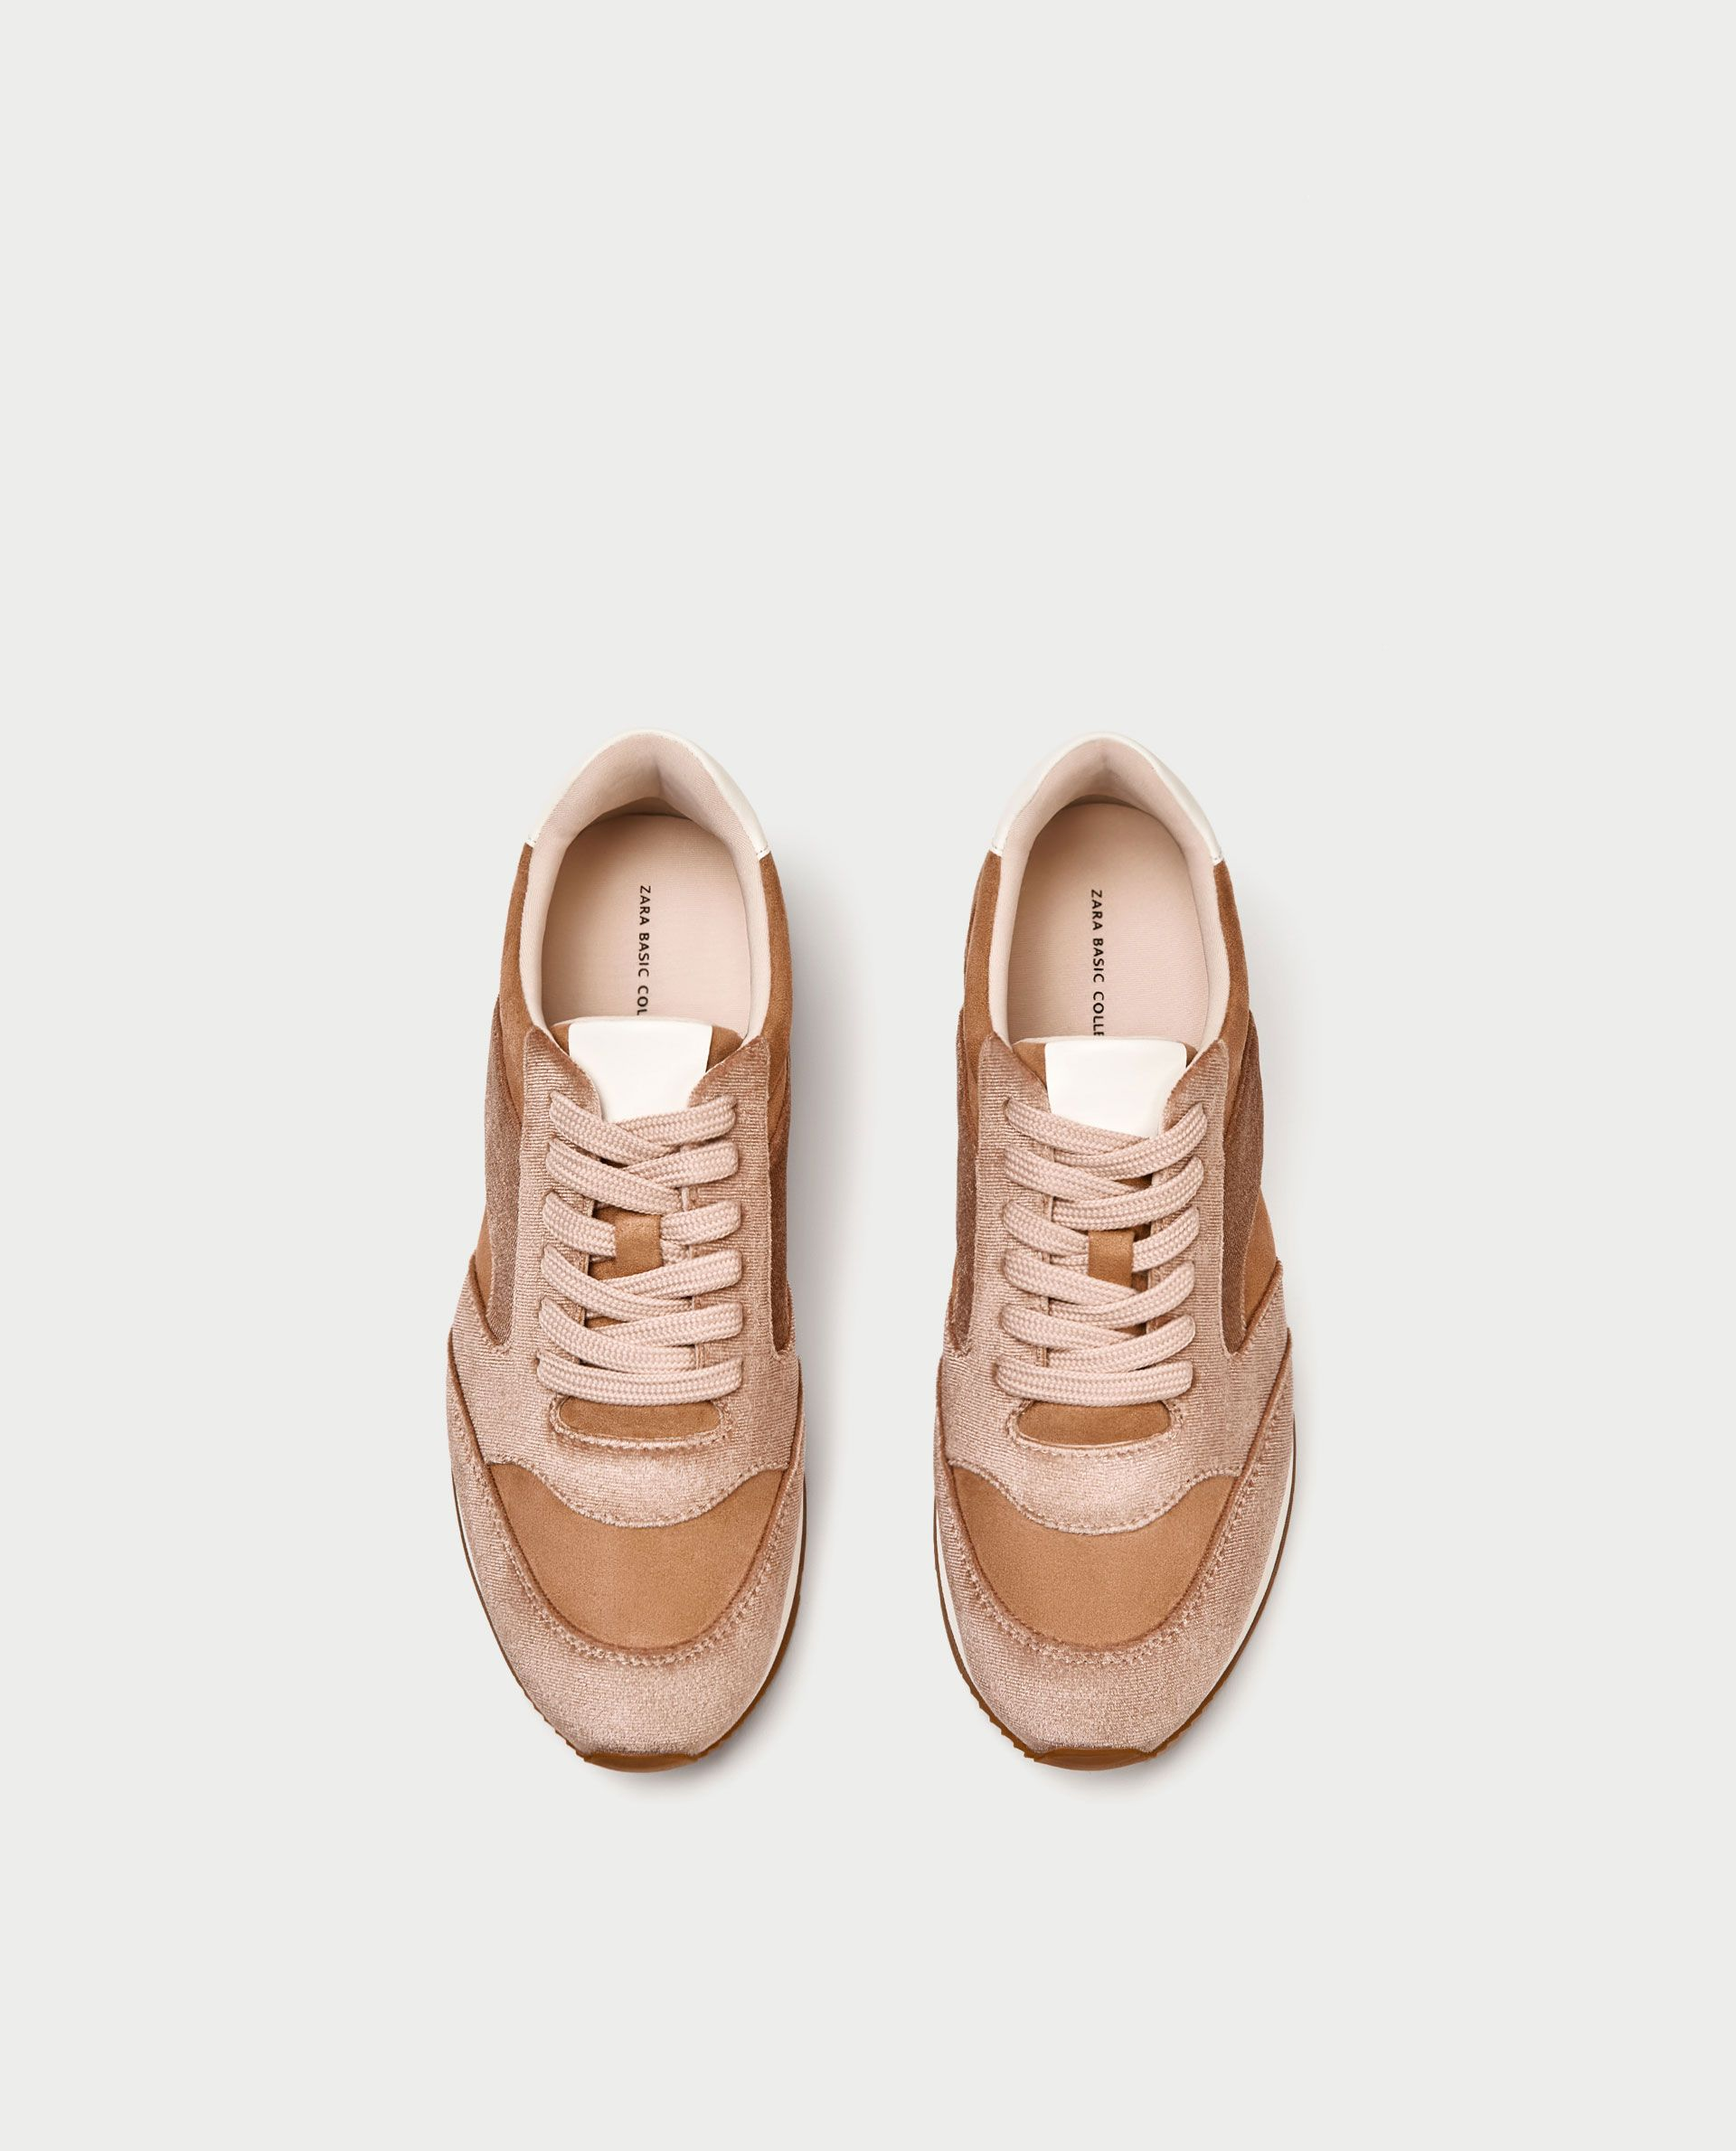 Velvet sneakers, Zara sneakers